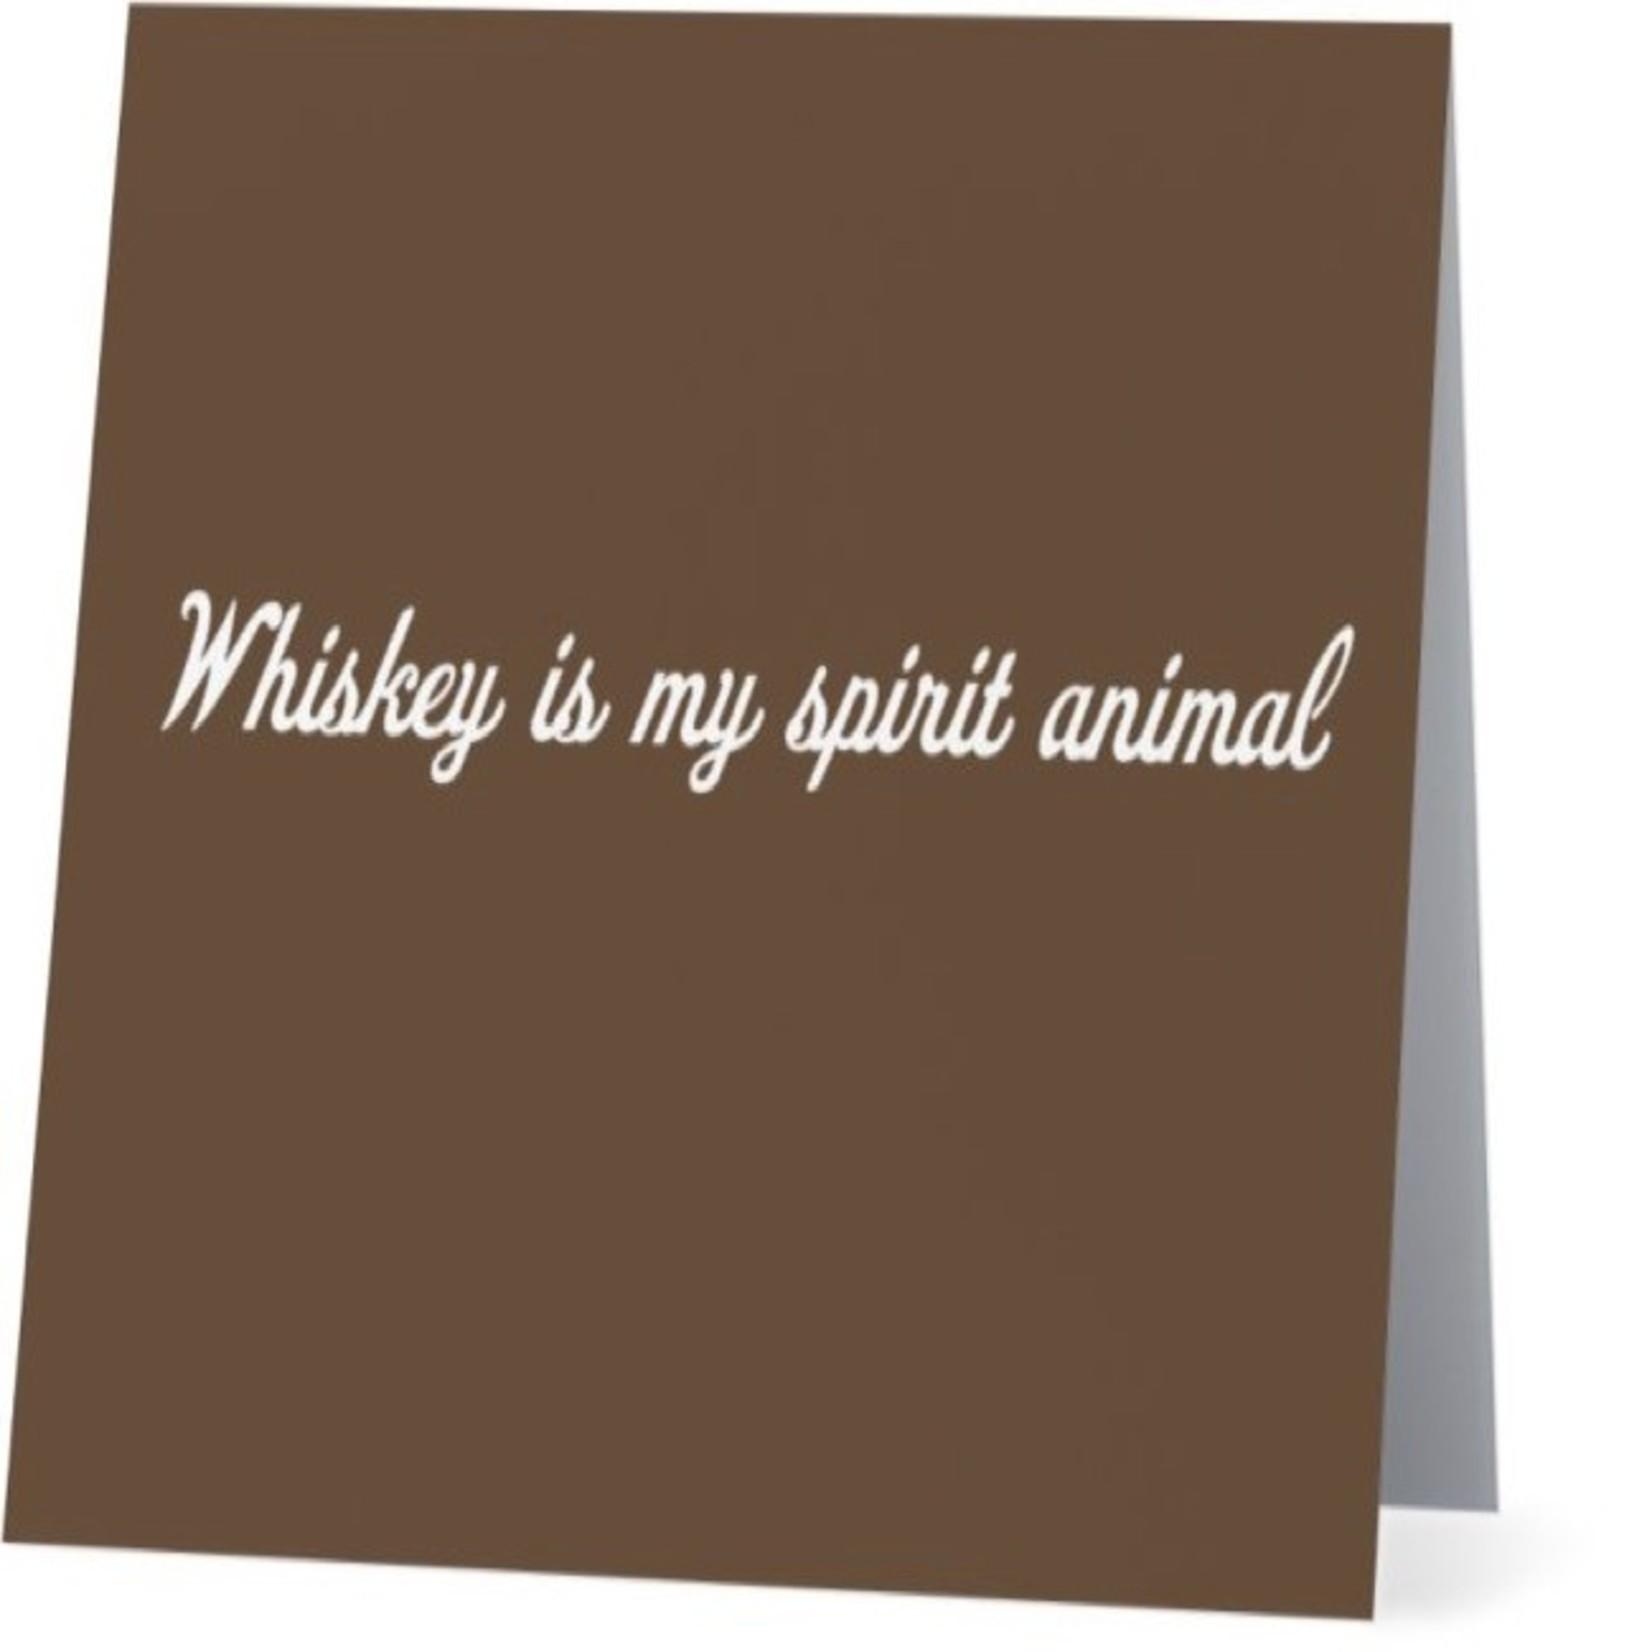 Bad Annie's Card #056 - Whiskey Is My Spirit Animal